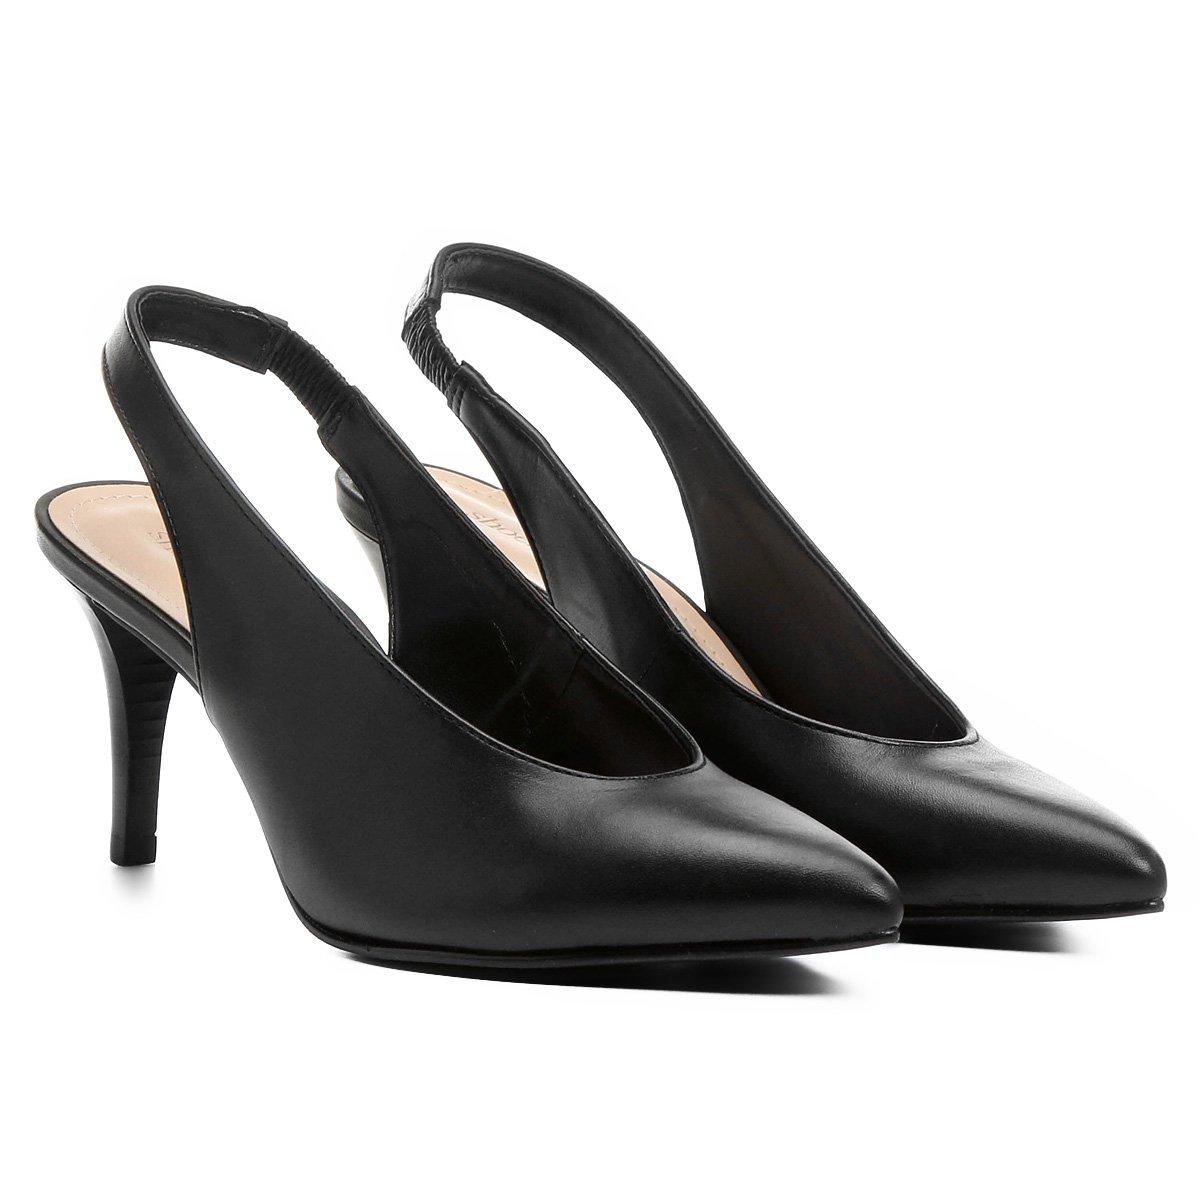 Shoestock Shoestock Salto Scarpin Aberto Couro Preto Couro Médio Scarpin dqUAUwI